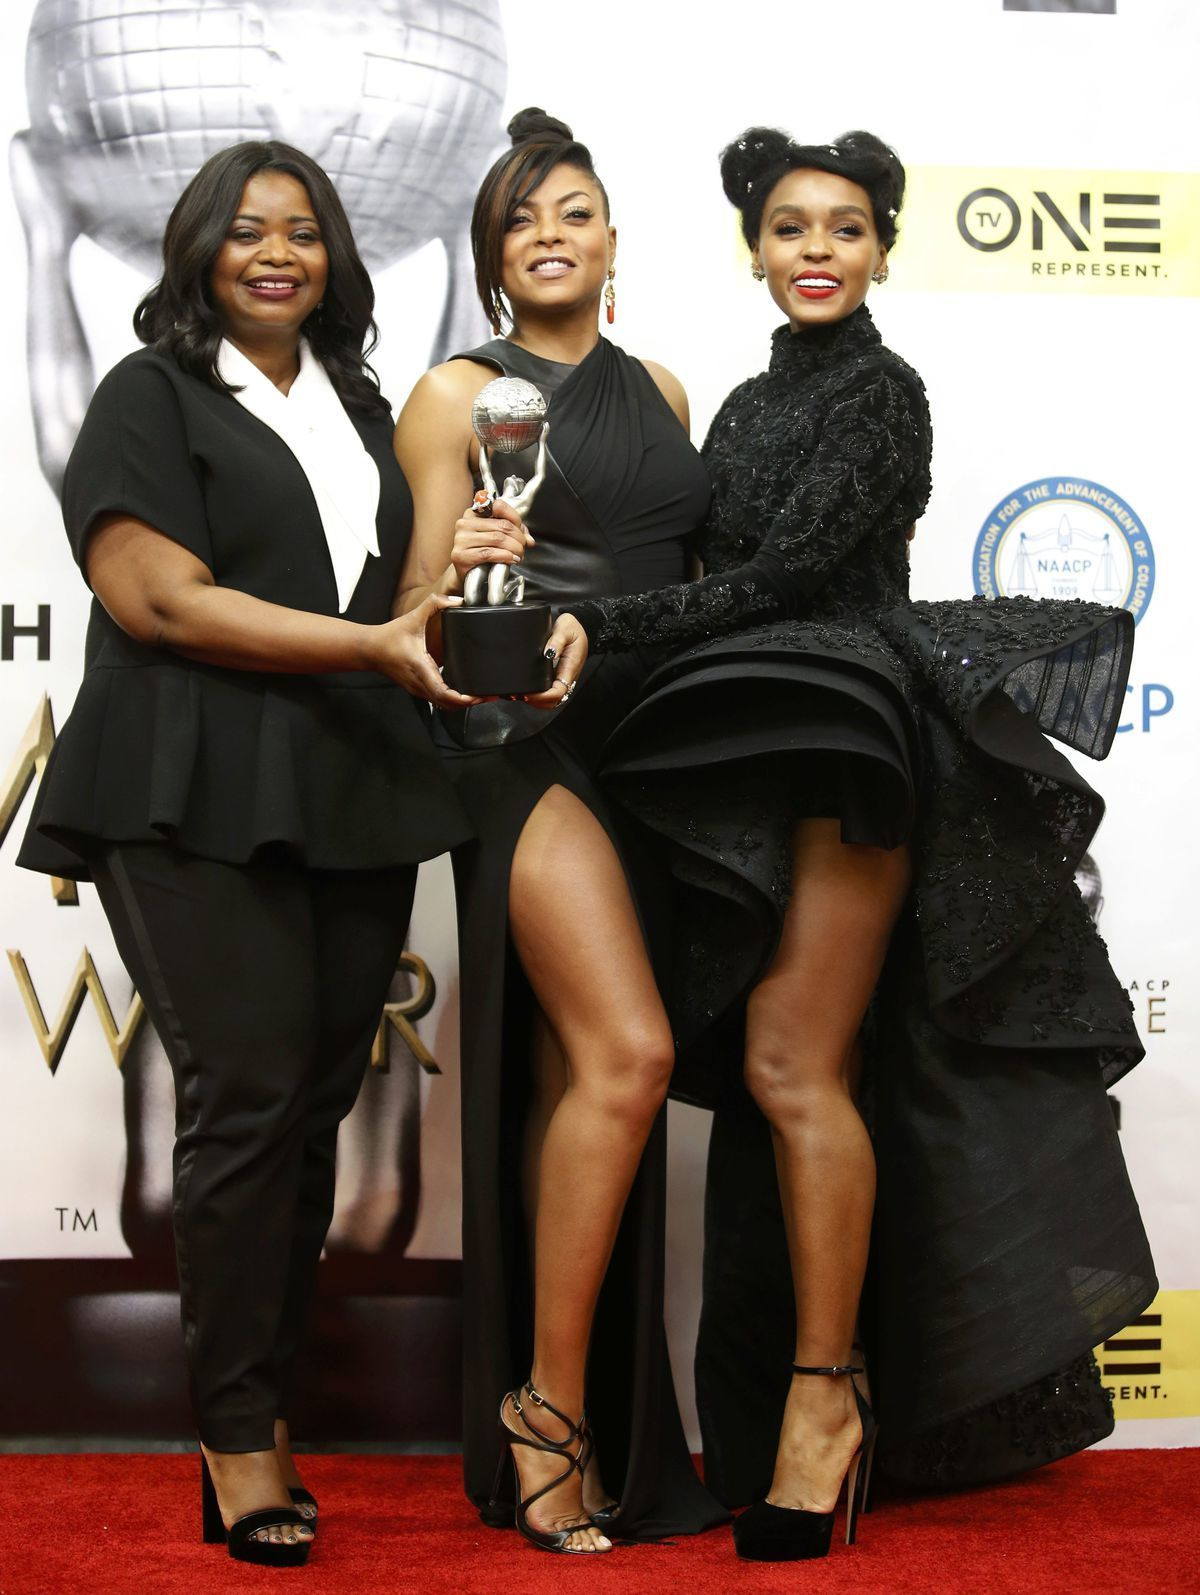 Zľava: Herečky Octavia Spencer, Taraji P. Henson a Janelle Monae sa tešili z úspechu filmu Hidden Figures.